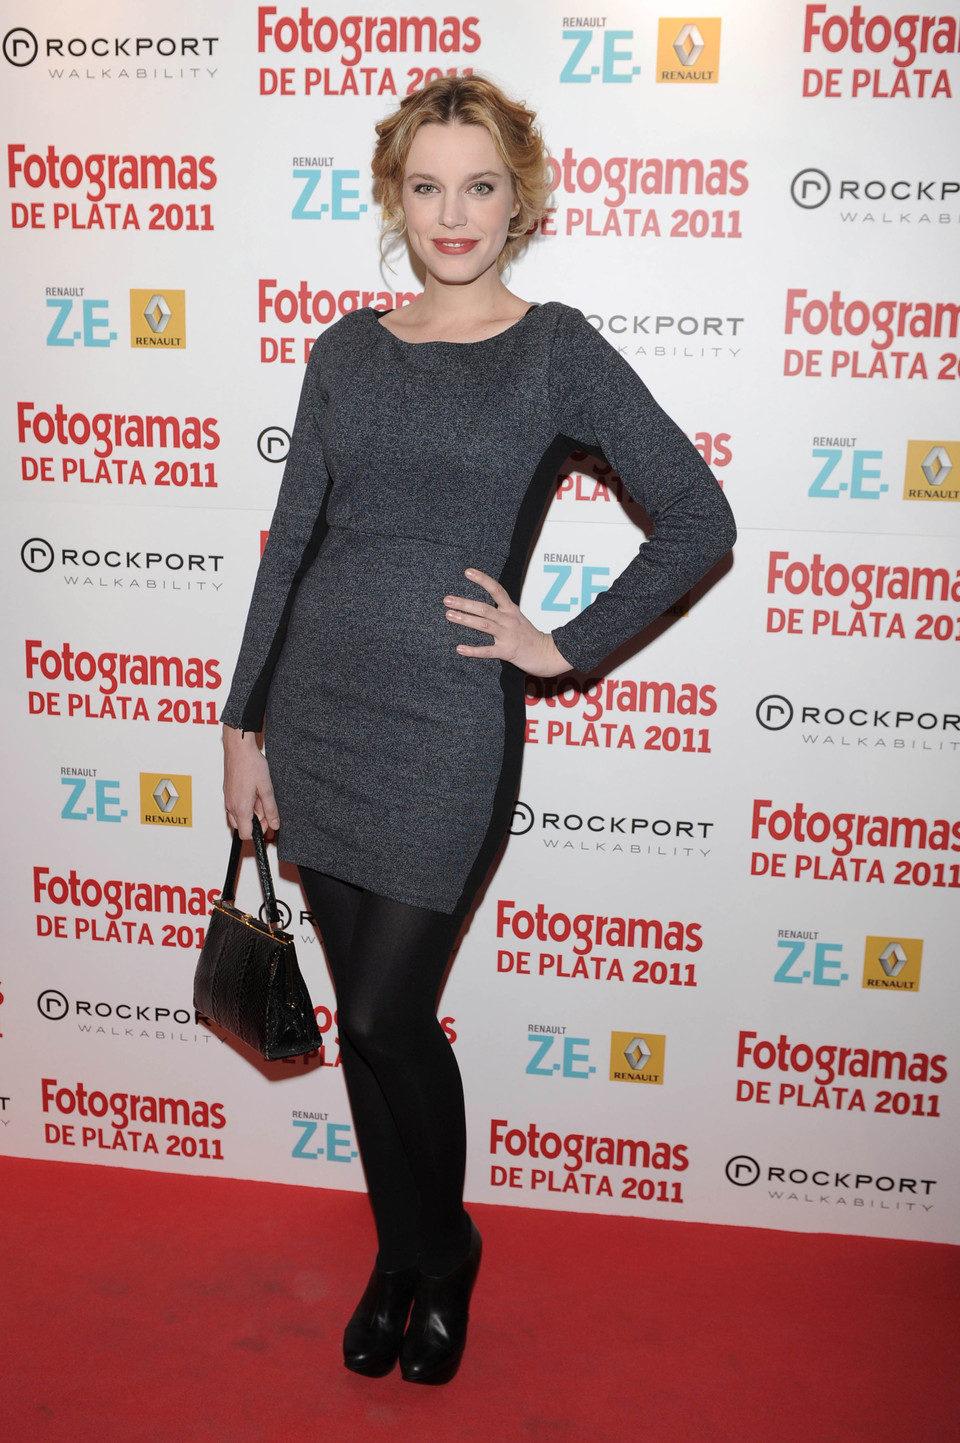 Carolina Bang en los Fotogramas de Plata 2011